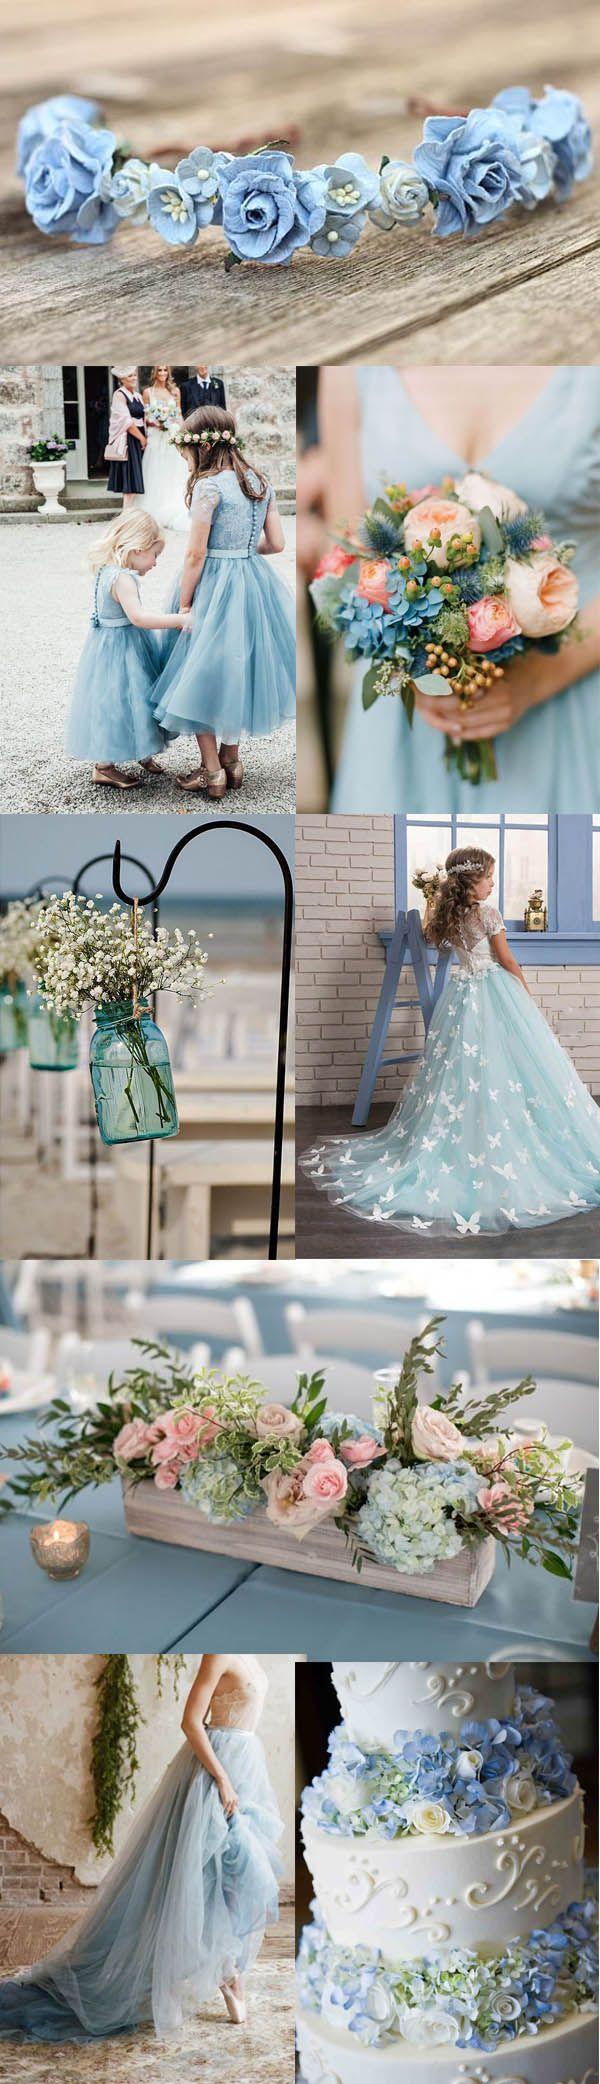 Material:Tulle|Embellishments:Appliques,Button,Lace,Flowers  #wedding #weddingdress #weddingbouquet #weddingshoes #bridesmaid #beach #beachwedding #lightblue